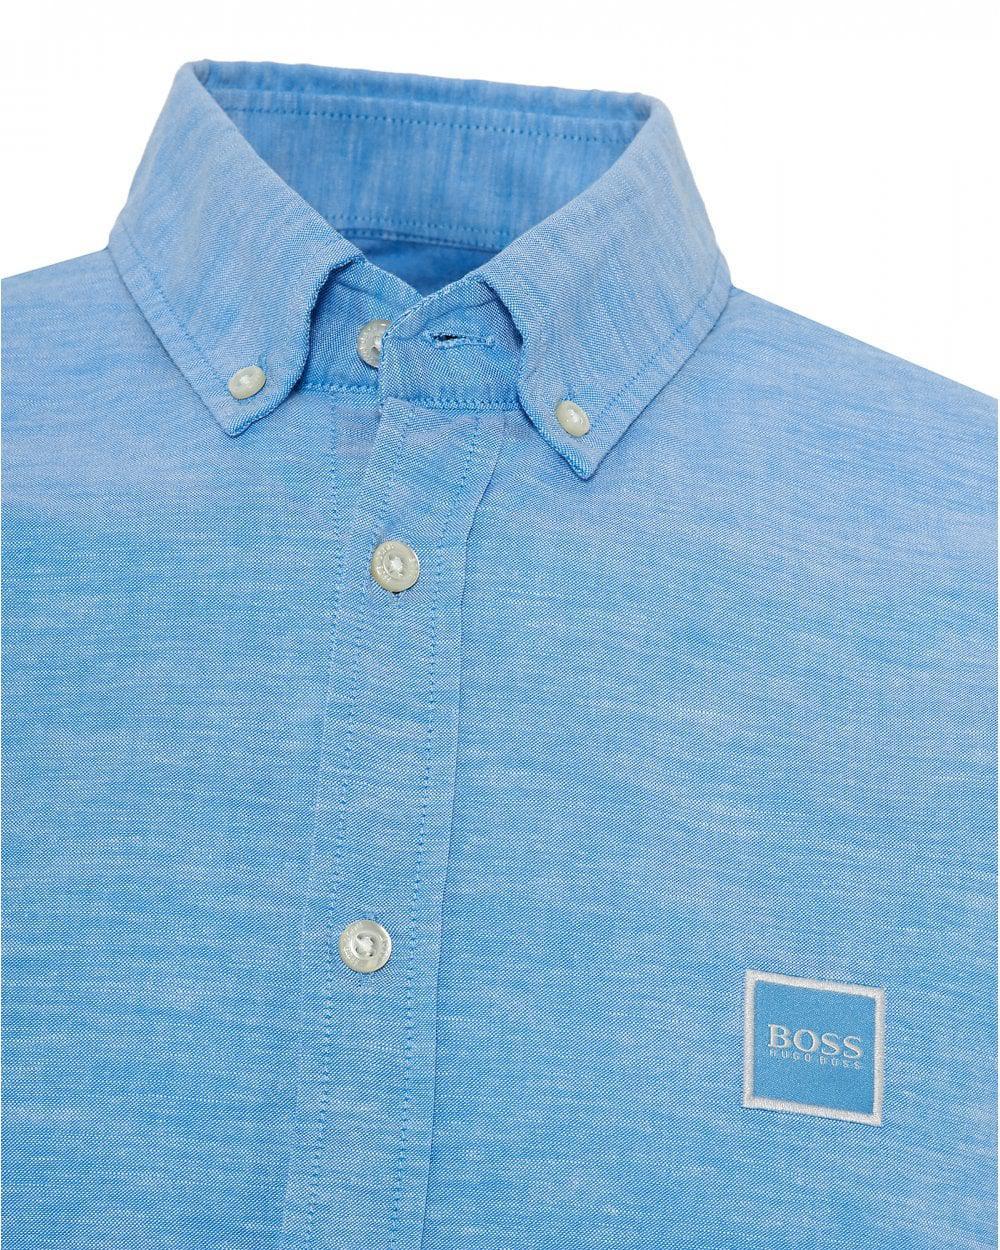 da9cbab9d BOSS - Mabsoot Slim Fit Sky Blue Oxford Shirt for Men - Lyst. View  fullscreen